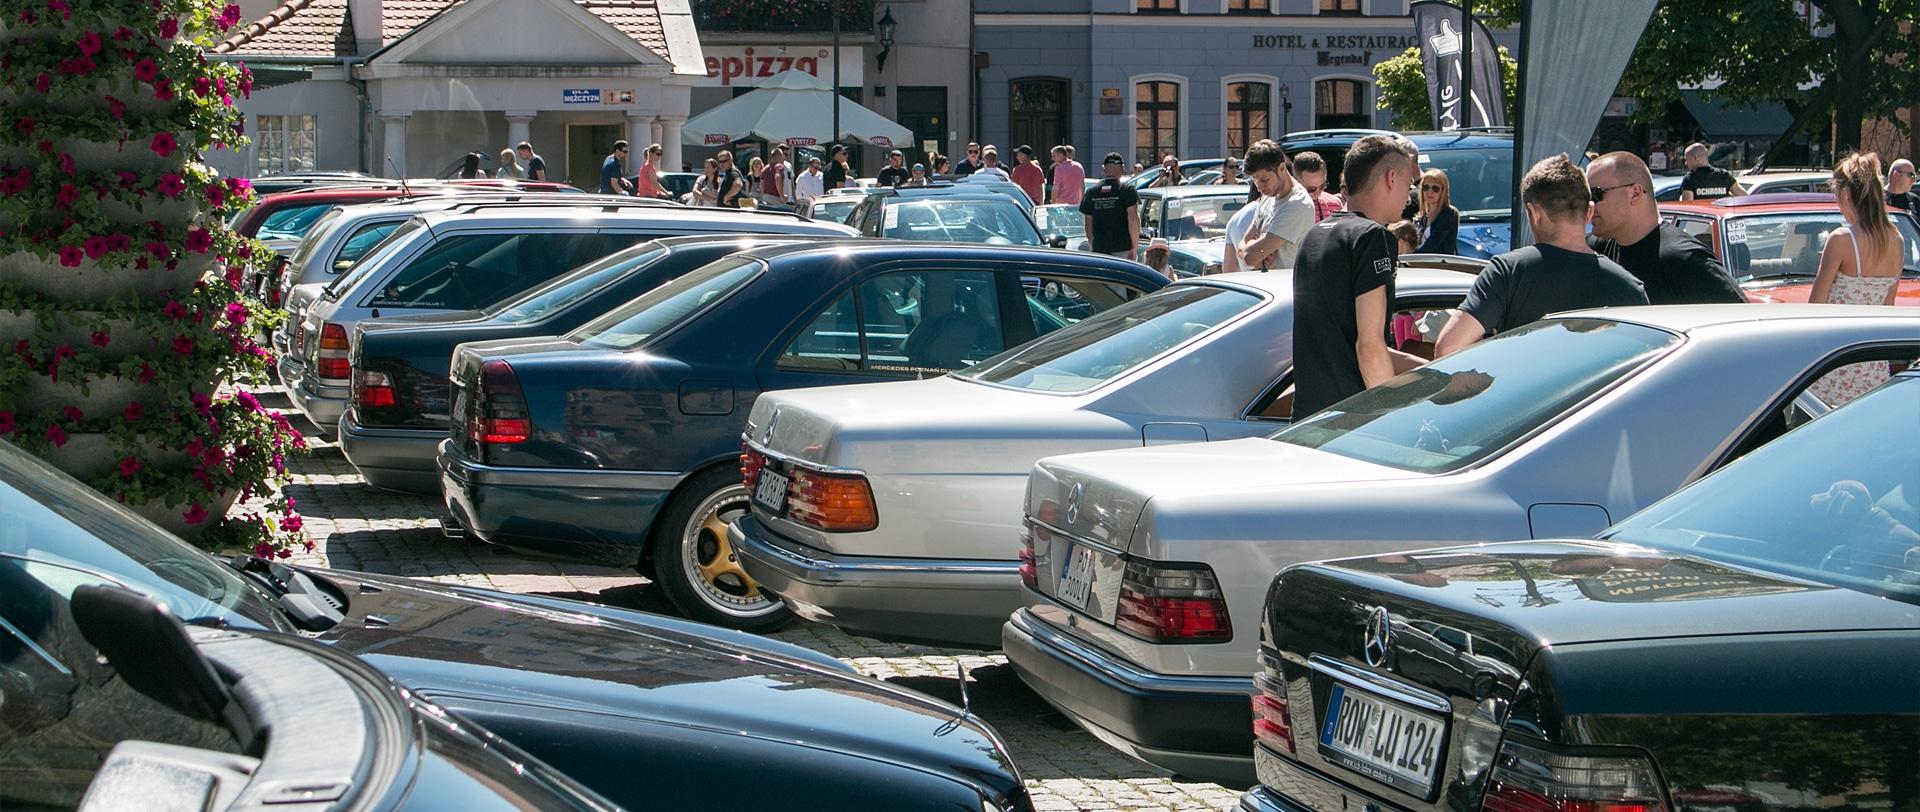 X Zlot Mercedes-Benz w Toruniu